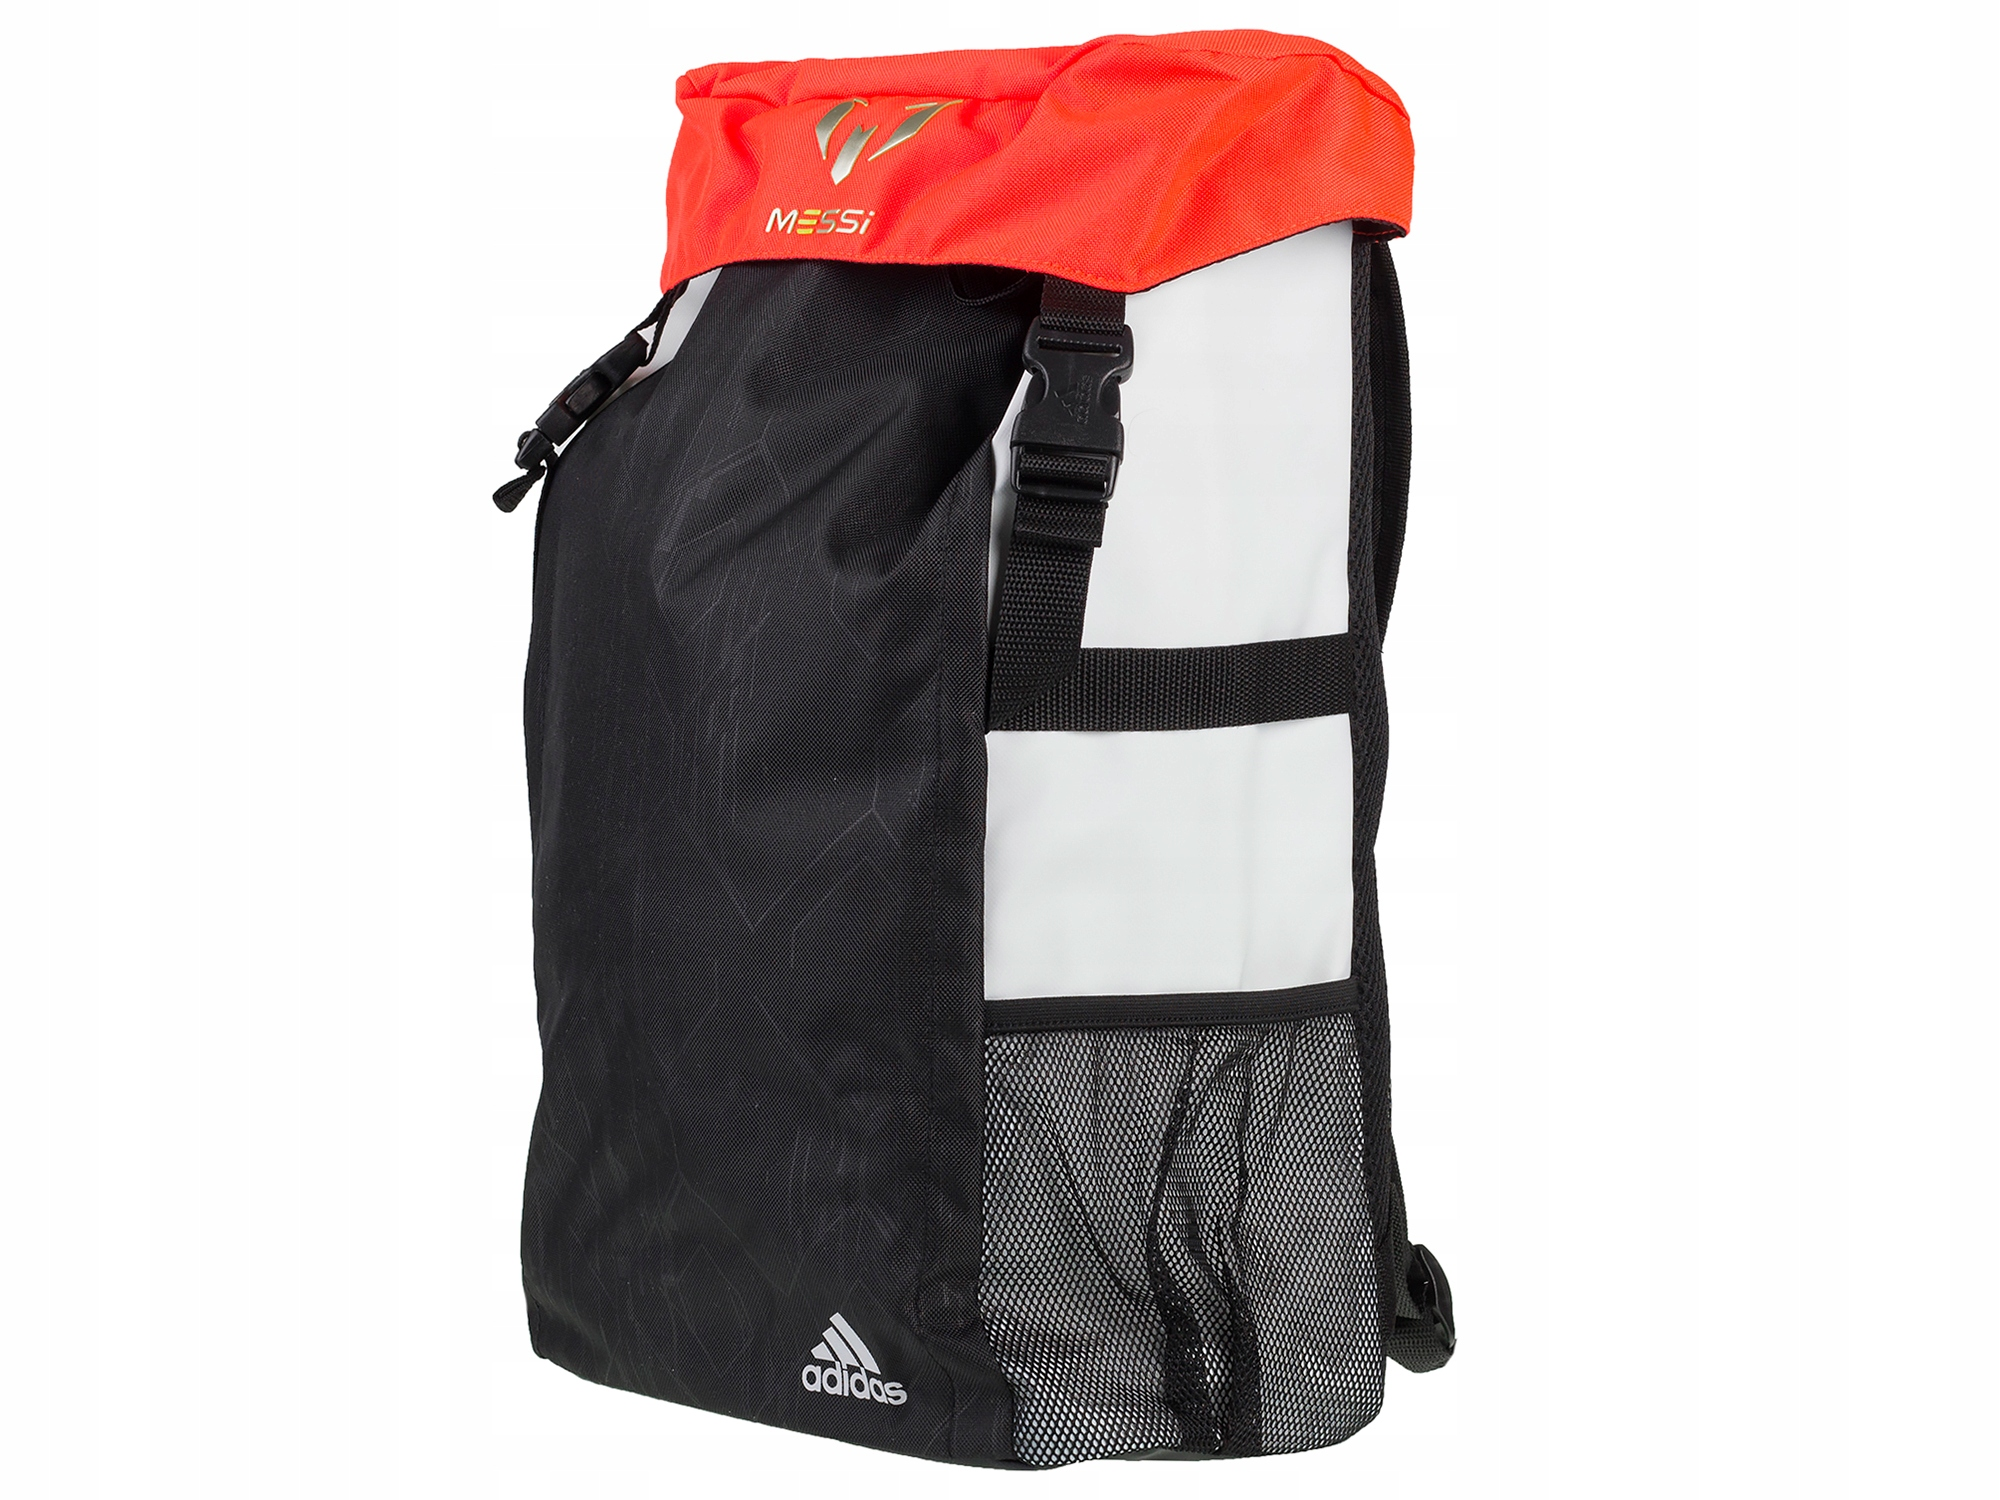 101e3f9fcf000 Plecak Adidas Messi Pojemny AI3736 - NS - 7076464931 - oficjalne archiwum  allegro